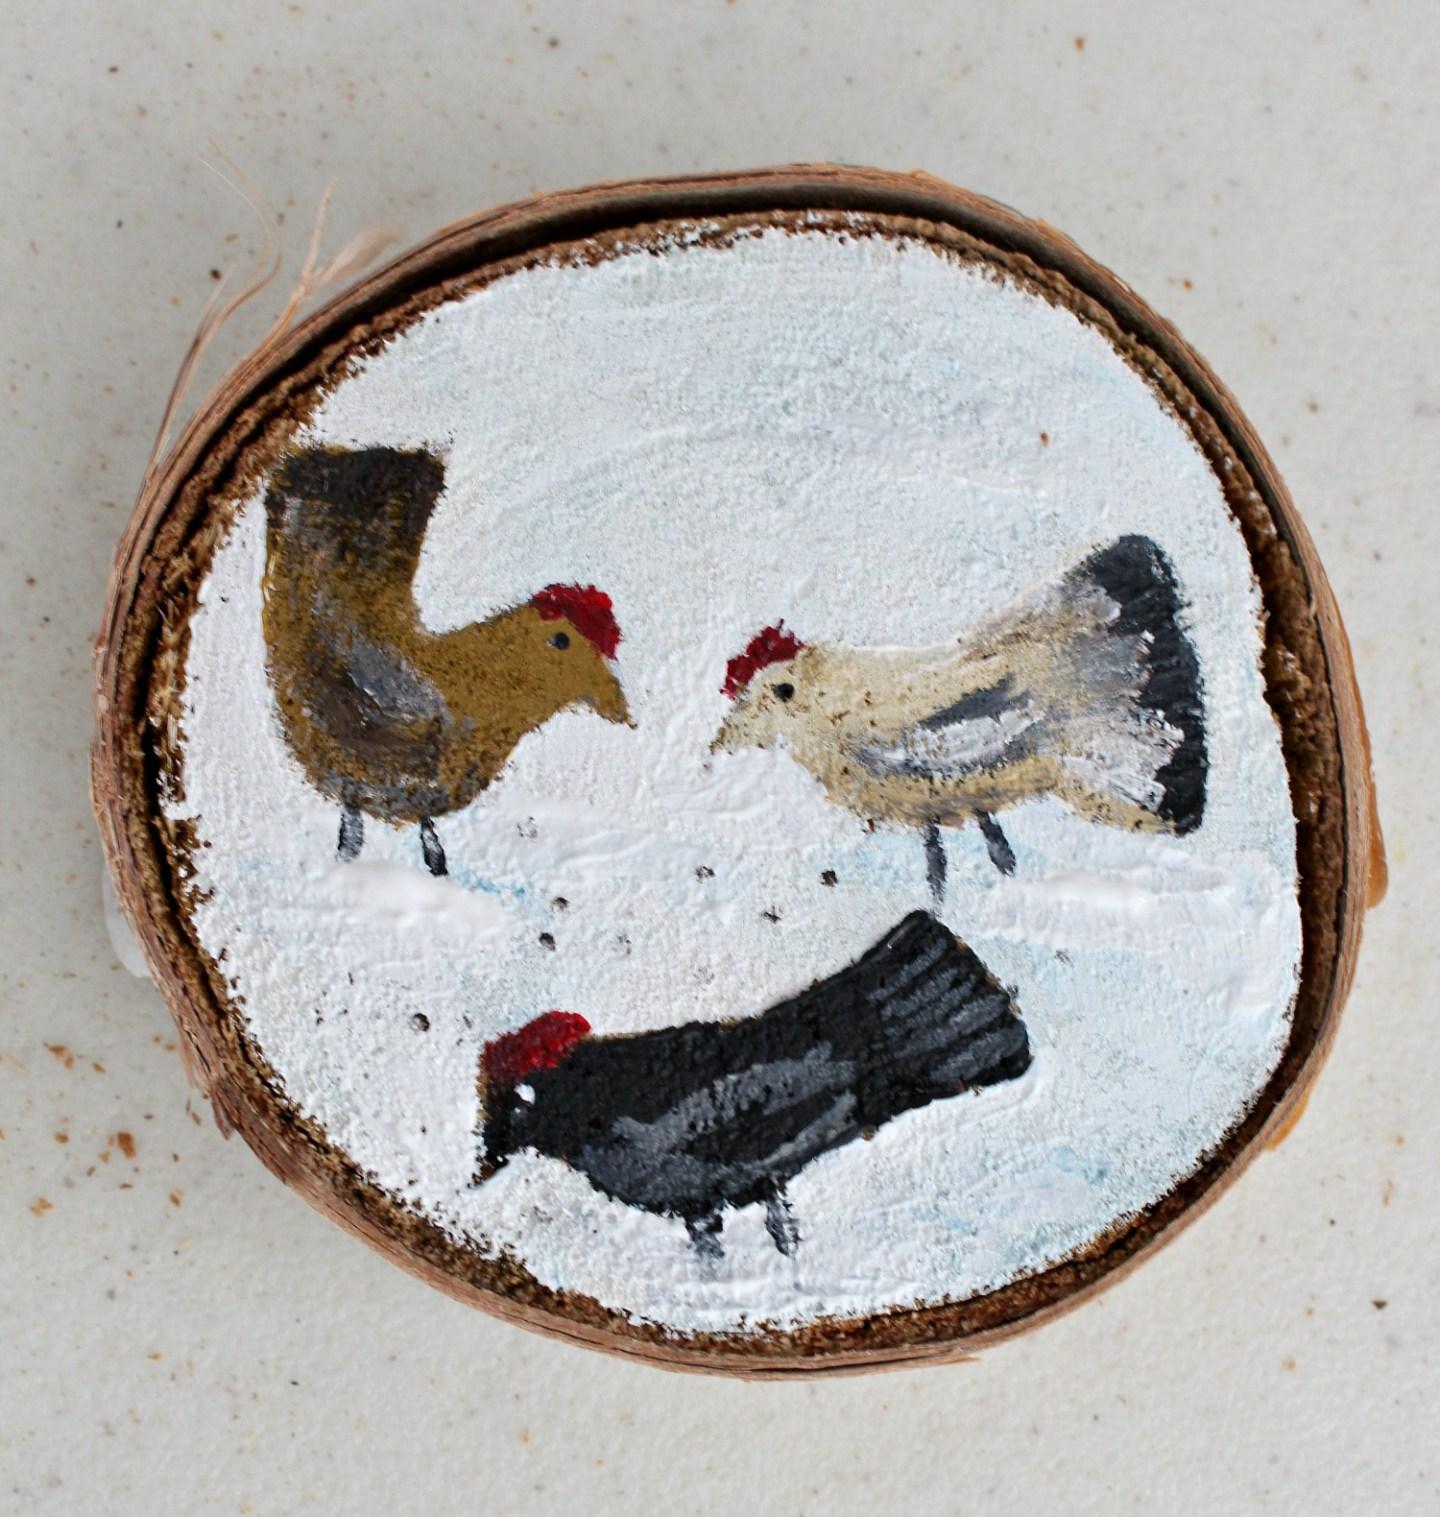 Homemade Chicken Ornament